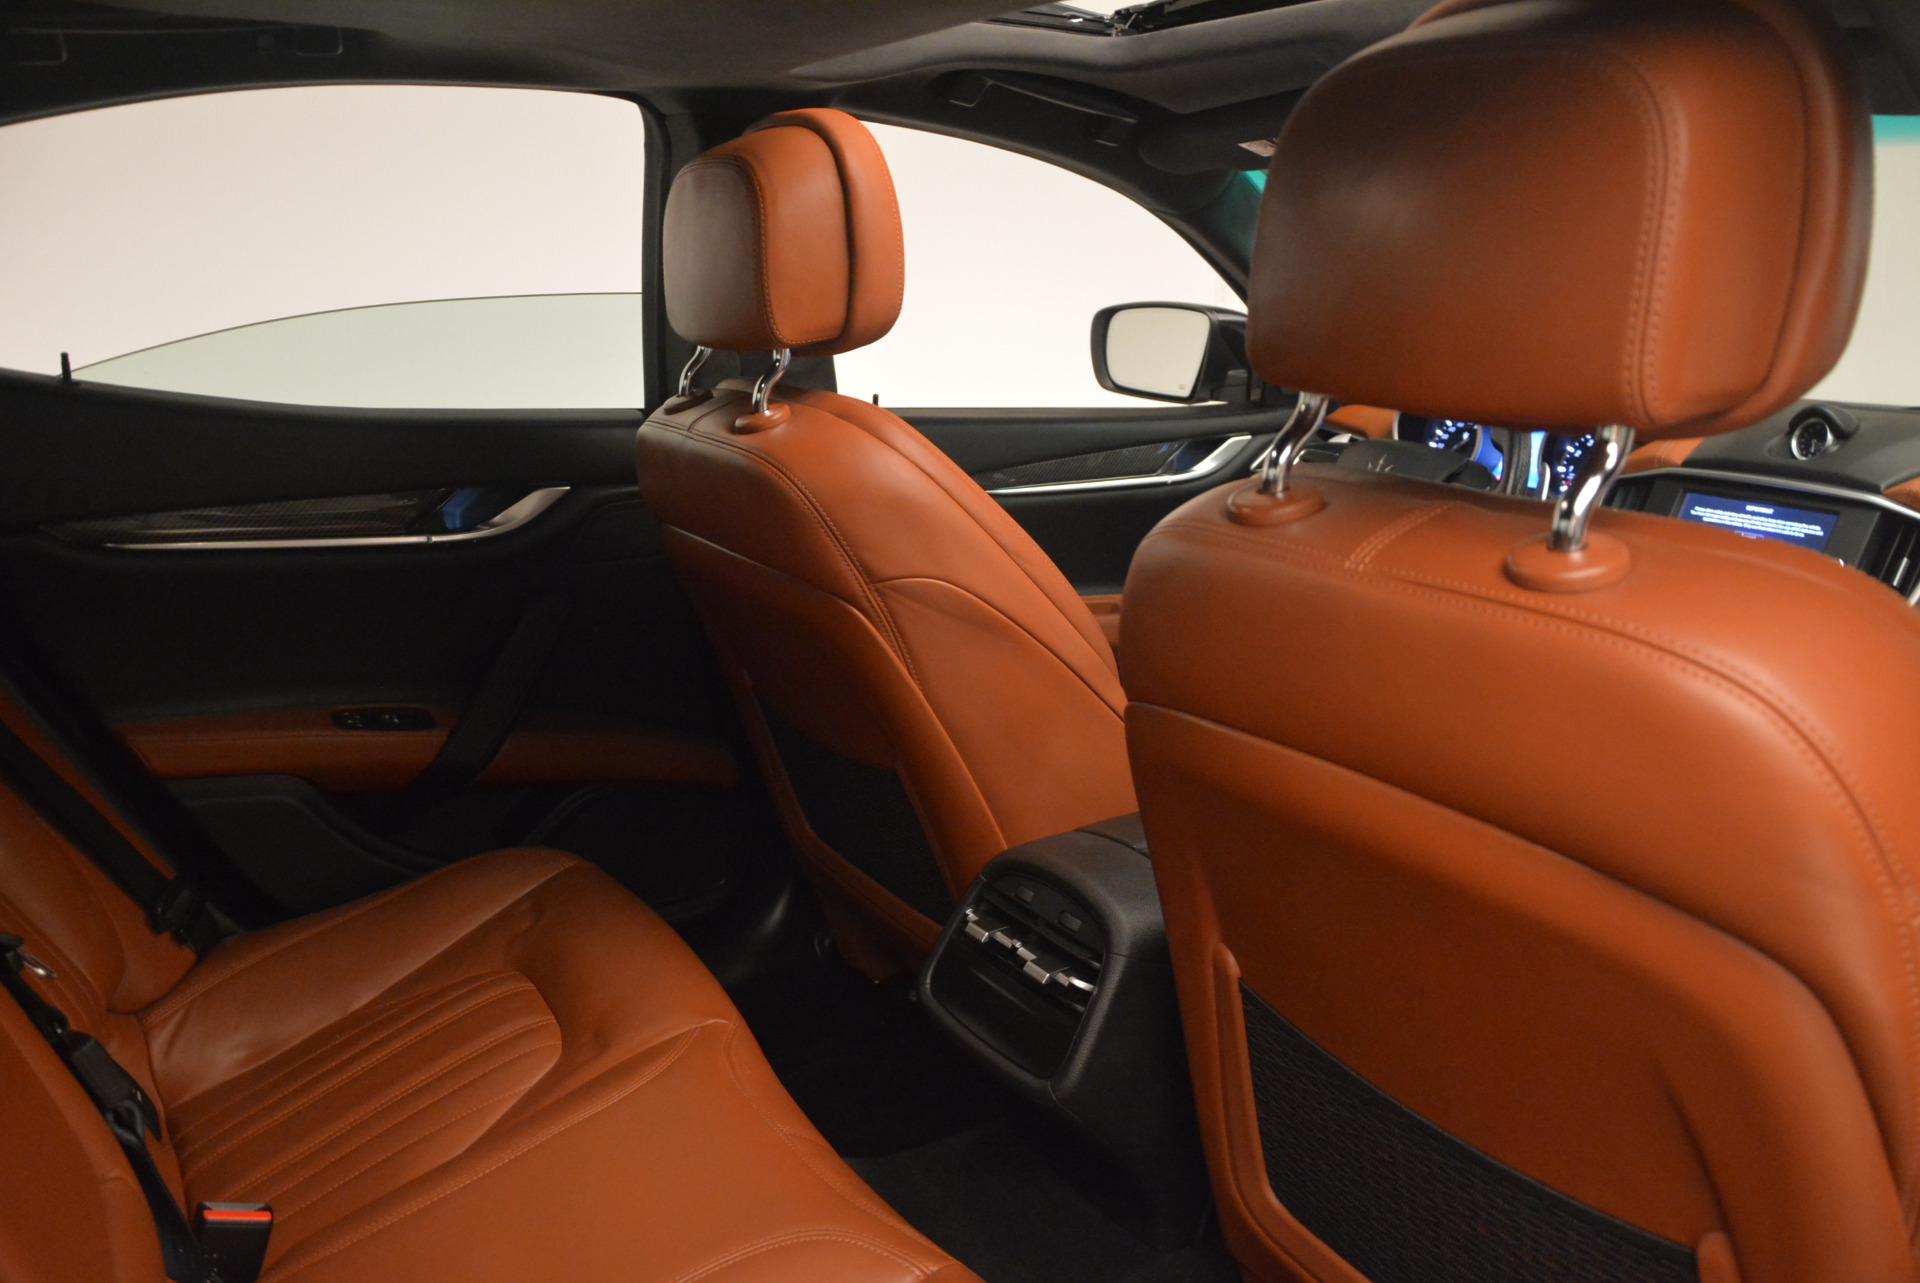 Used 2014 Maserati Ghibli S Q4 For Sale In Greenwich, CT 805_p23